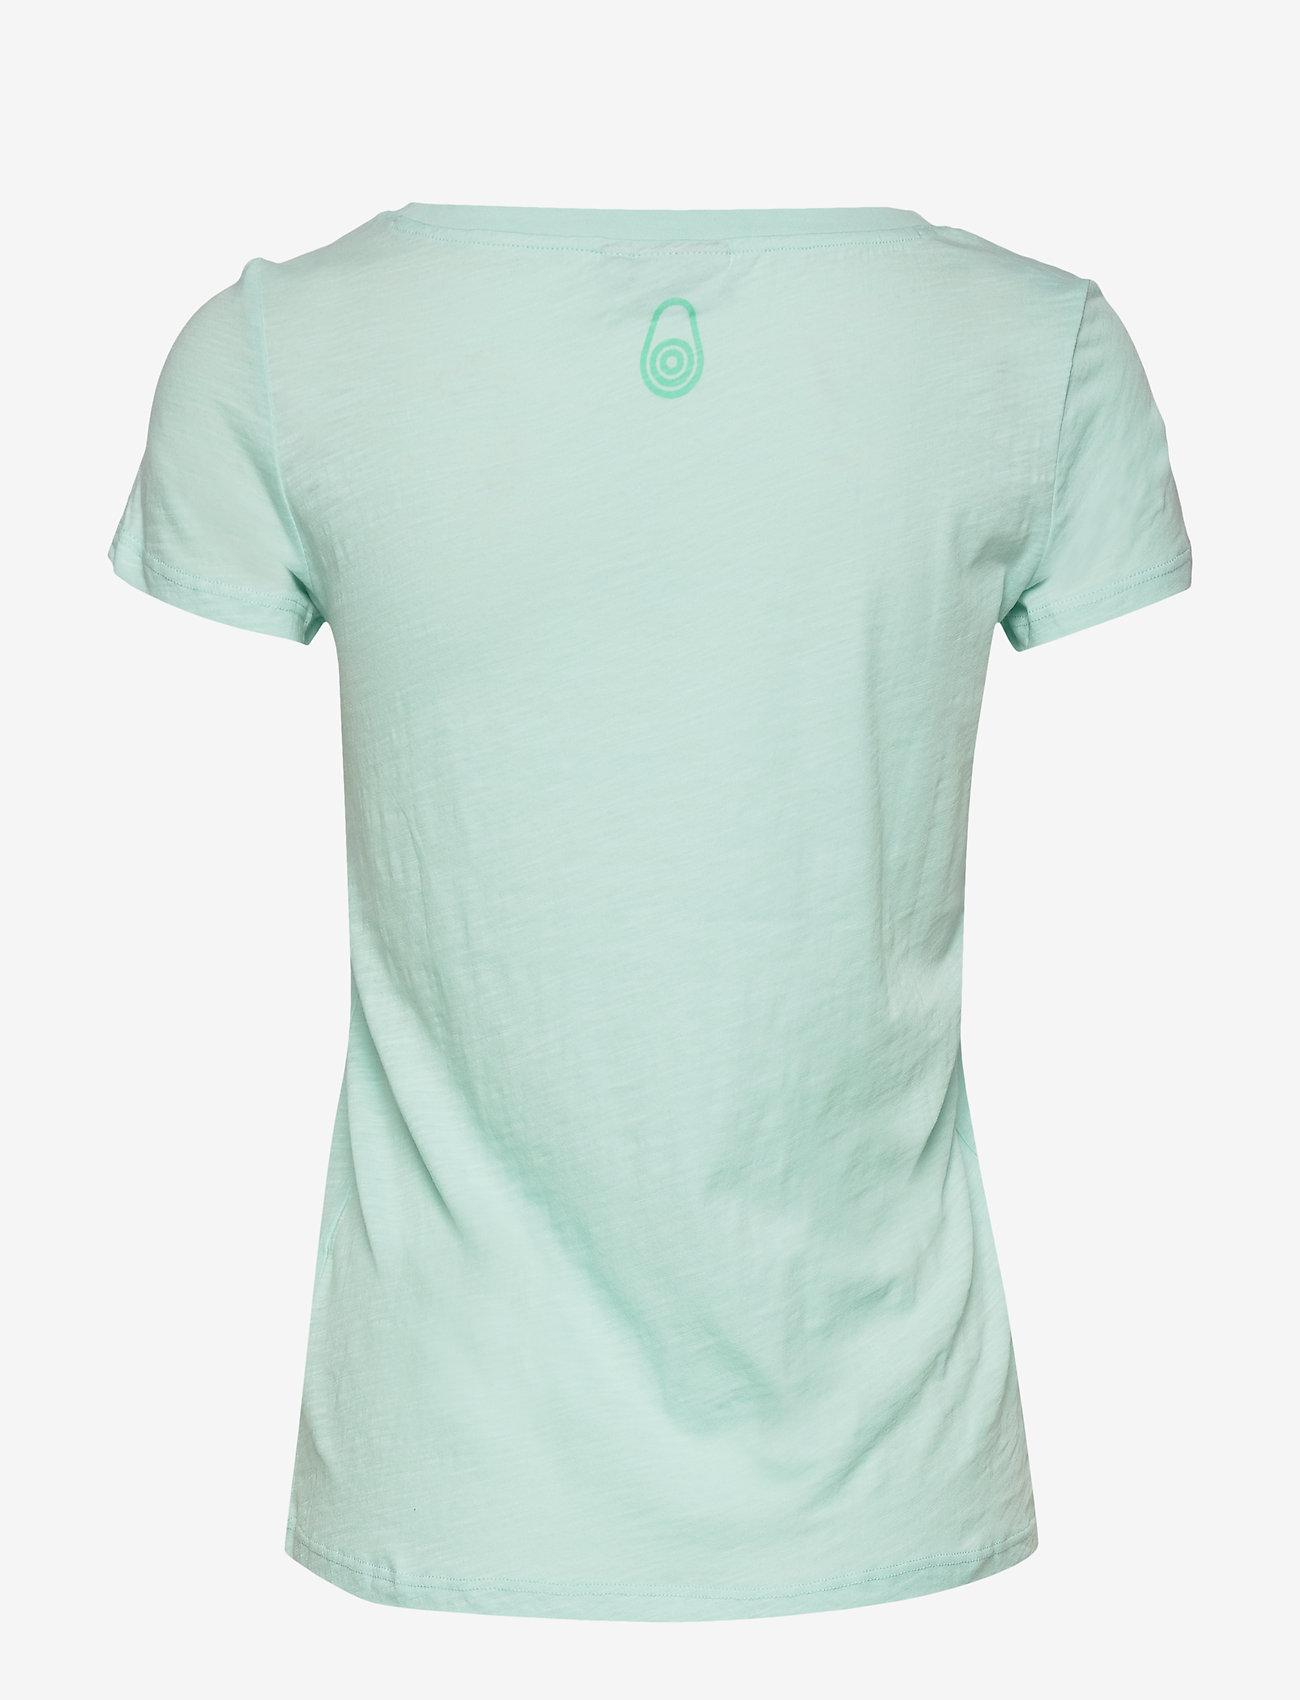 Sail Racing - W GALE TEE - t-shirts - aqua flow - 1